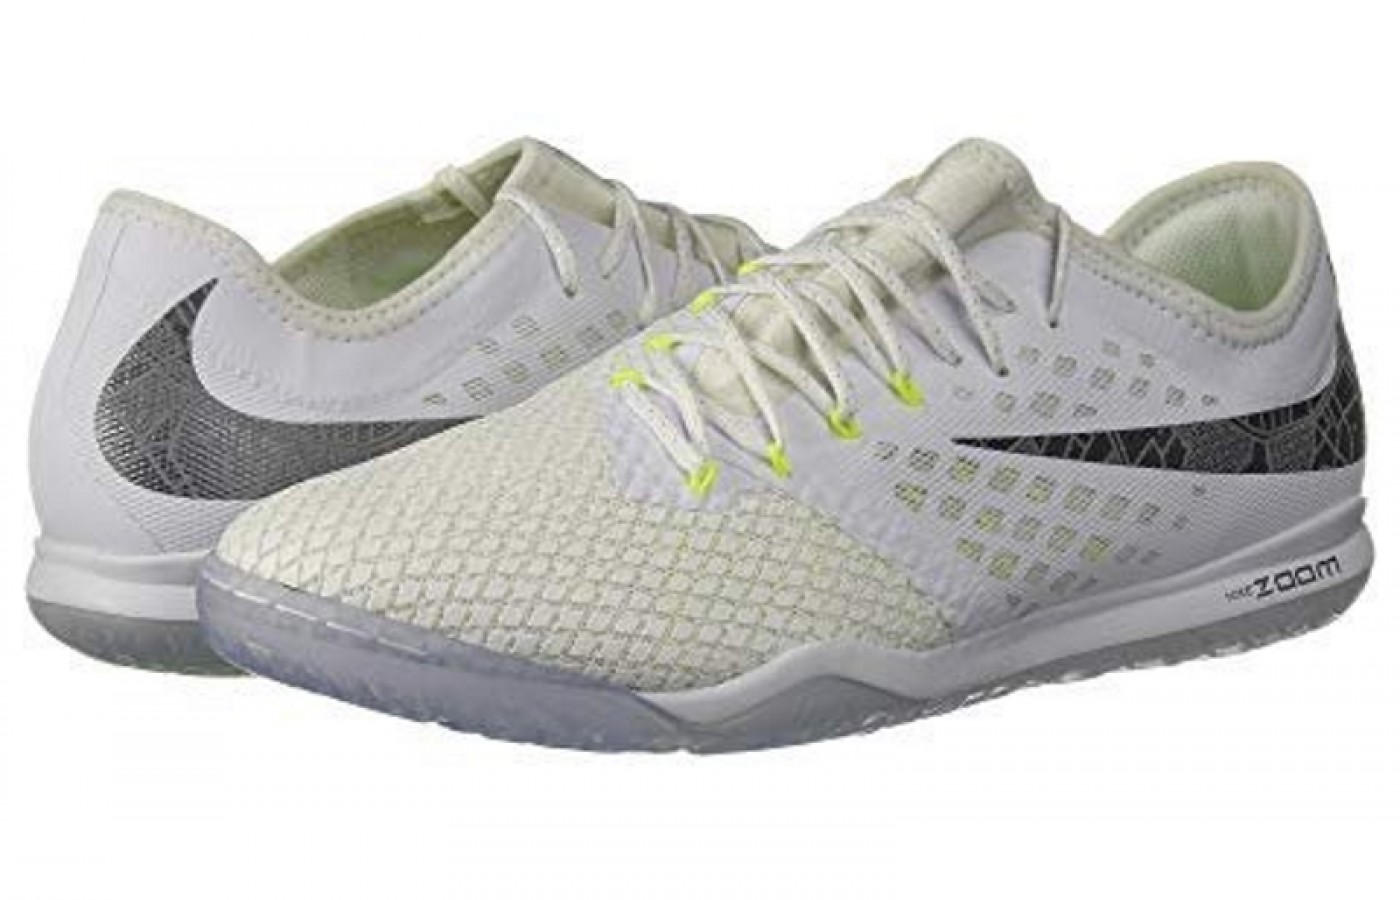 Nike Zoom Hypervenom X 3 Pro IC Angled View